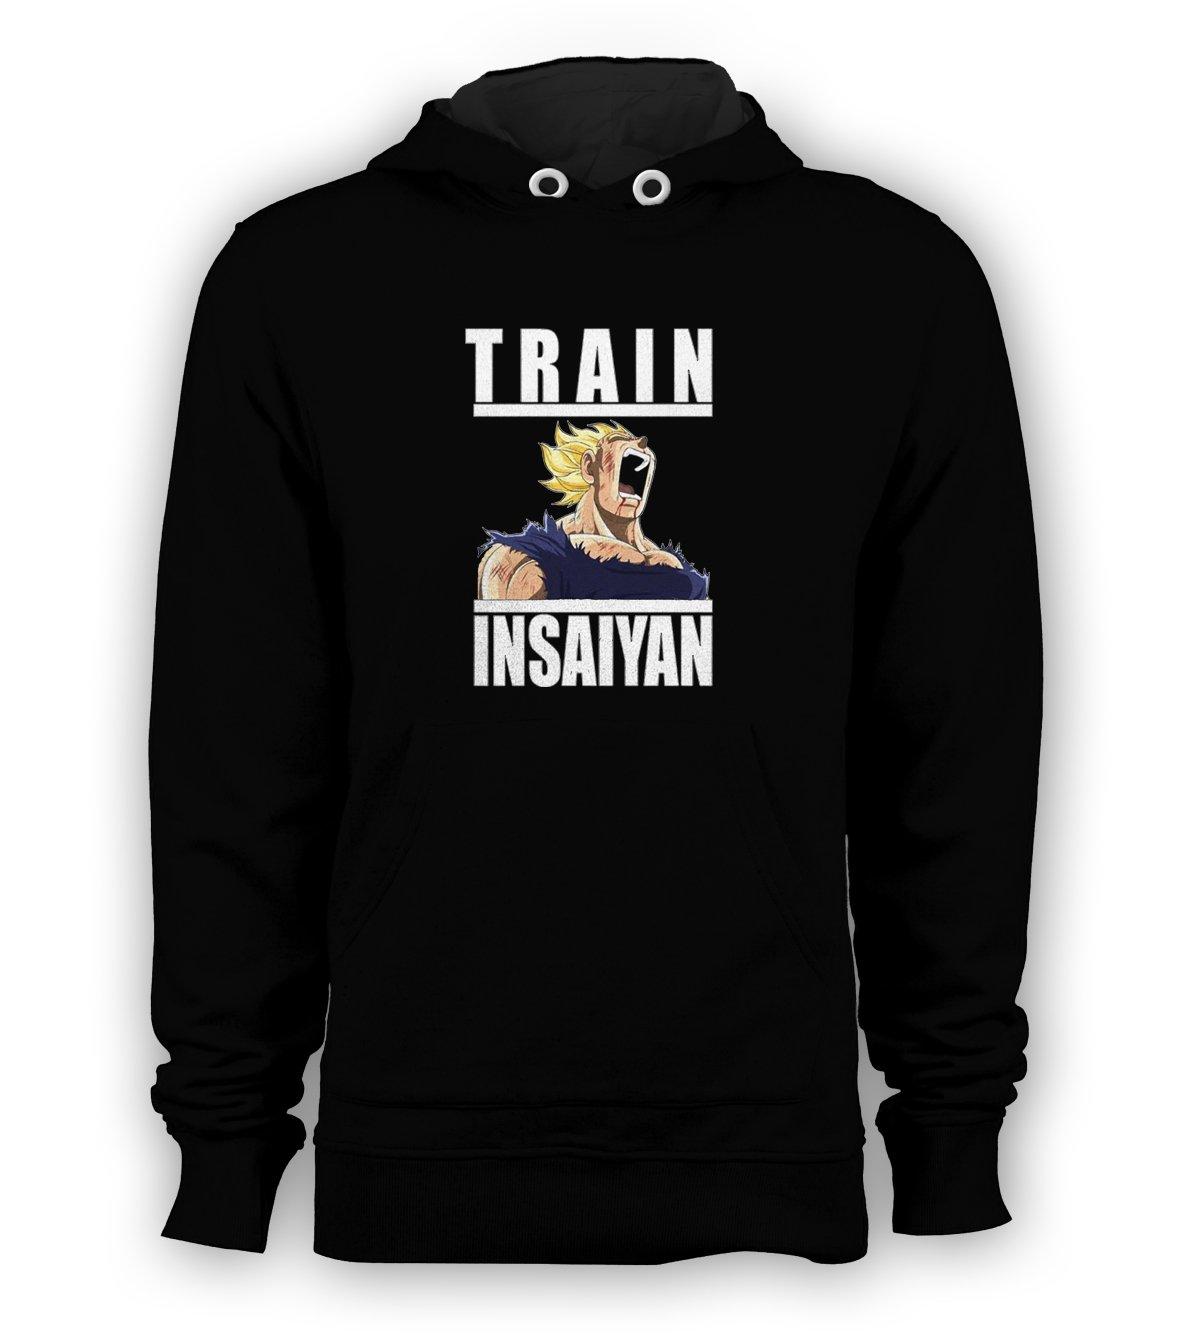 Train Insaiyan DBZ Super Gym Dragon Ball Z Pullover Hoodie Men Sweatshirts Size S to 3XL New Black